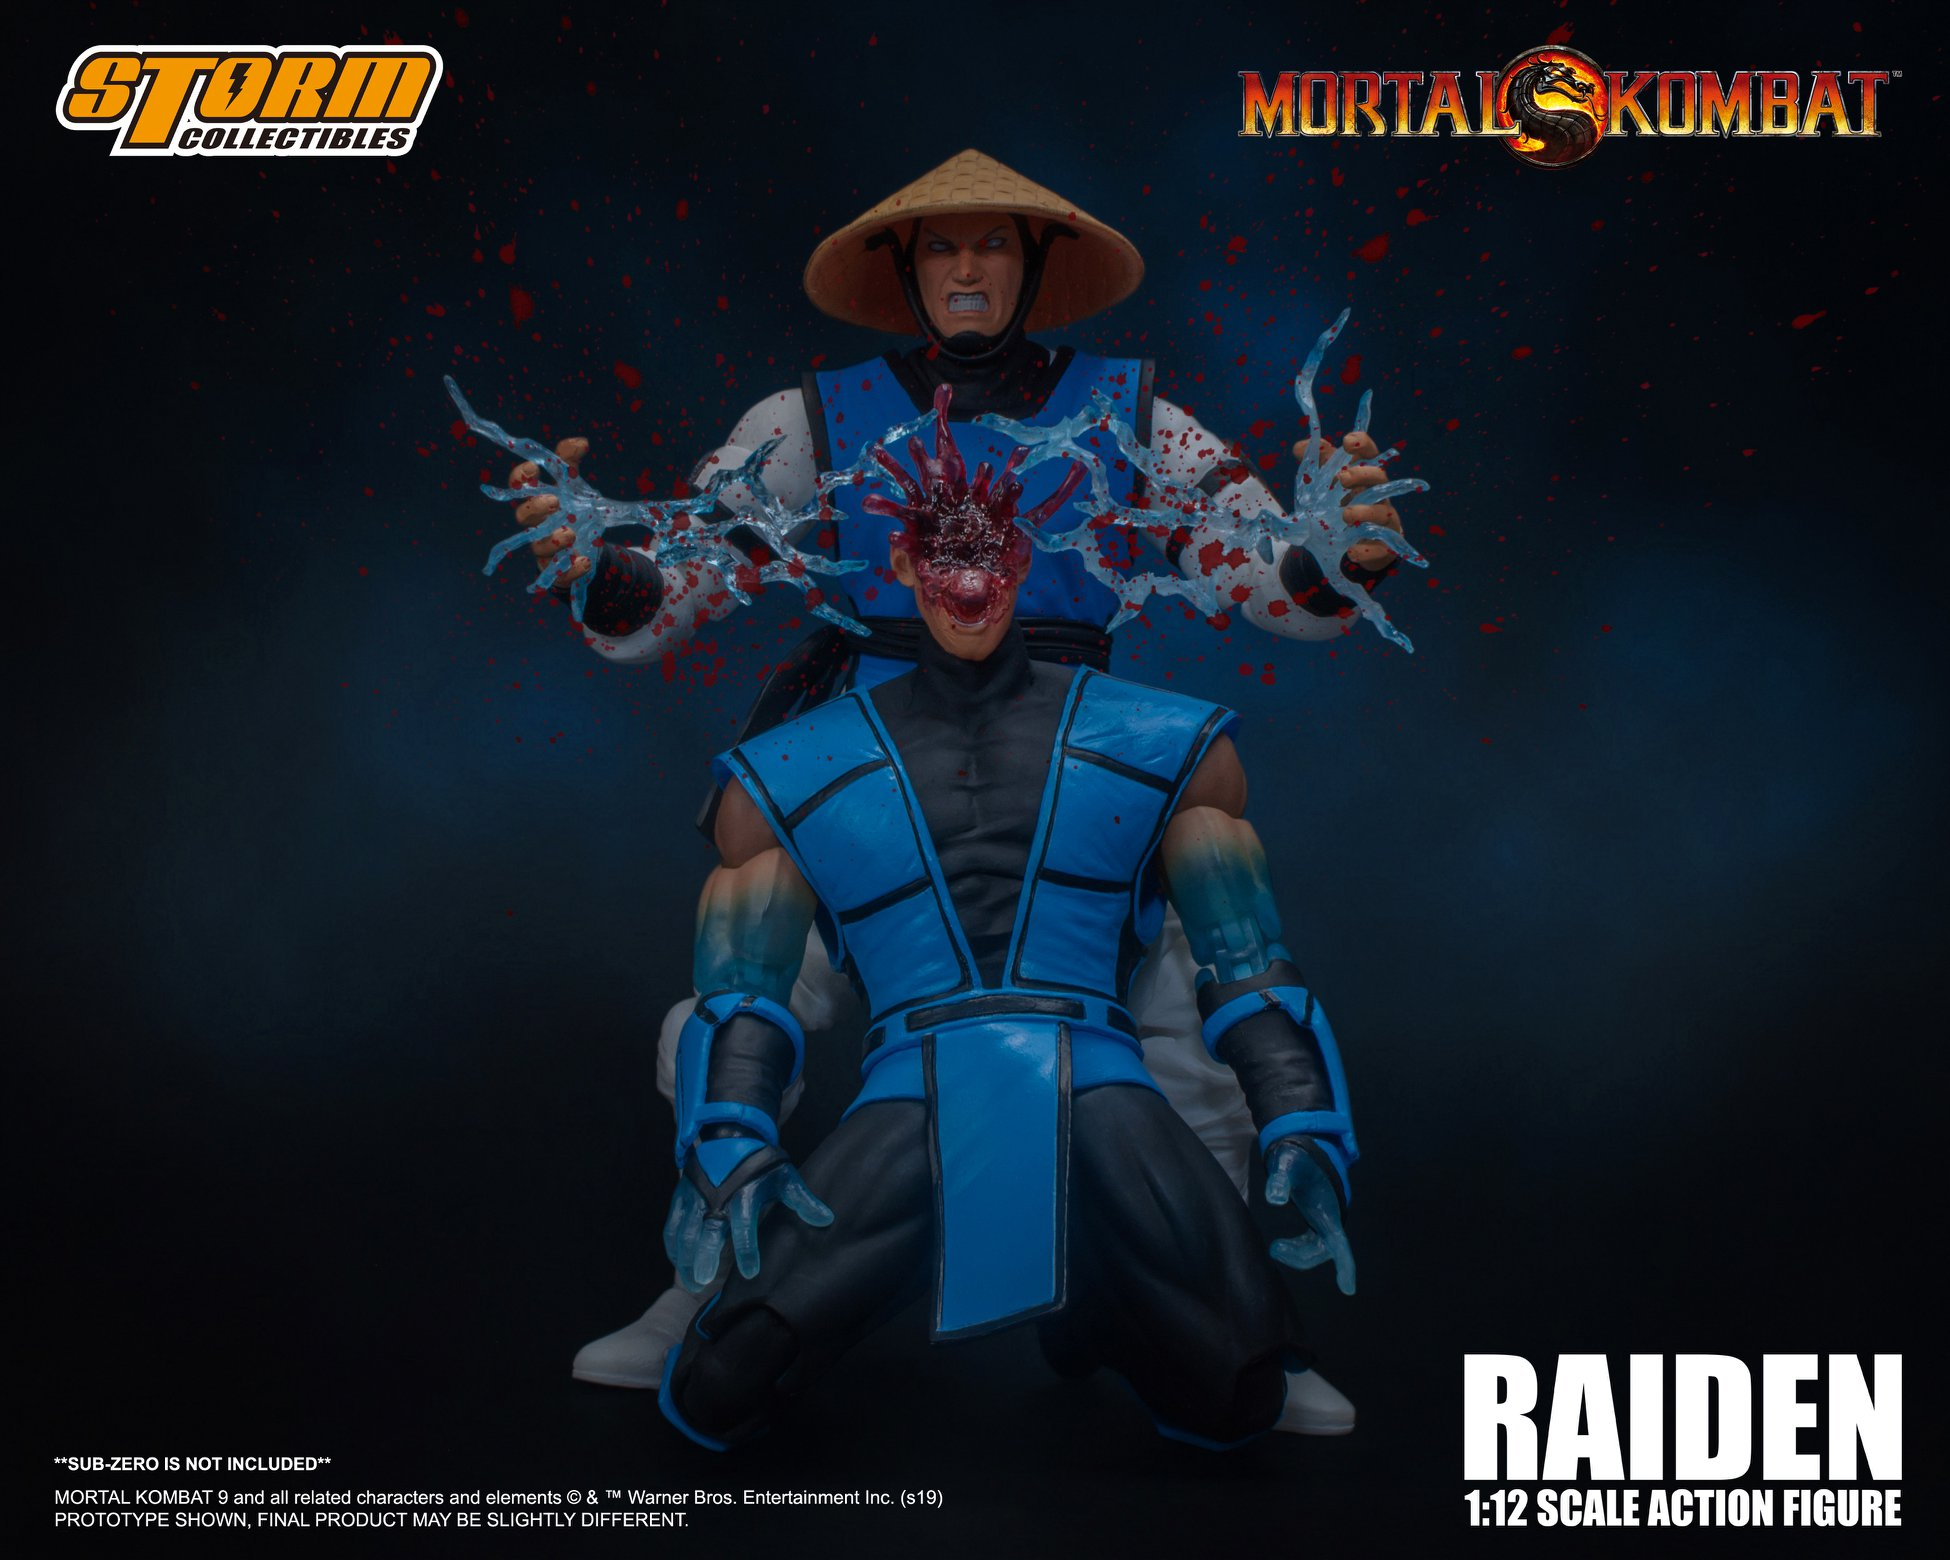 Storm Collectibles Mortal Kombat Raiden